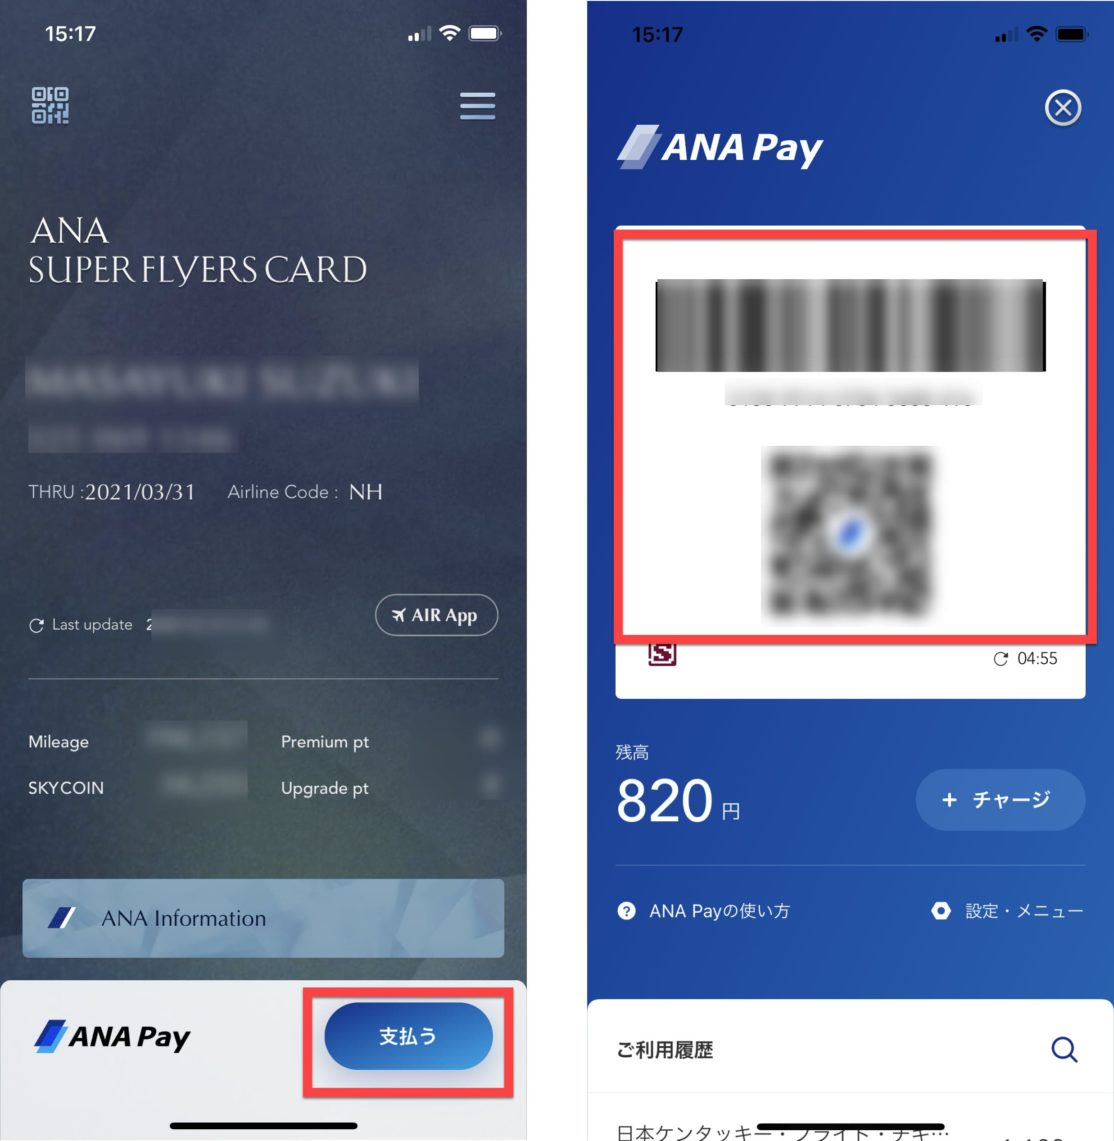 ANA Pay支払い方